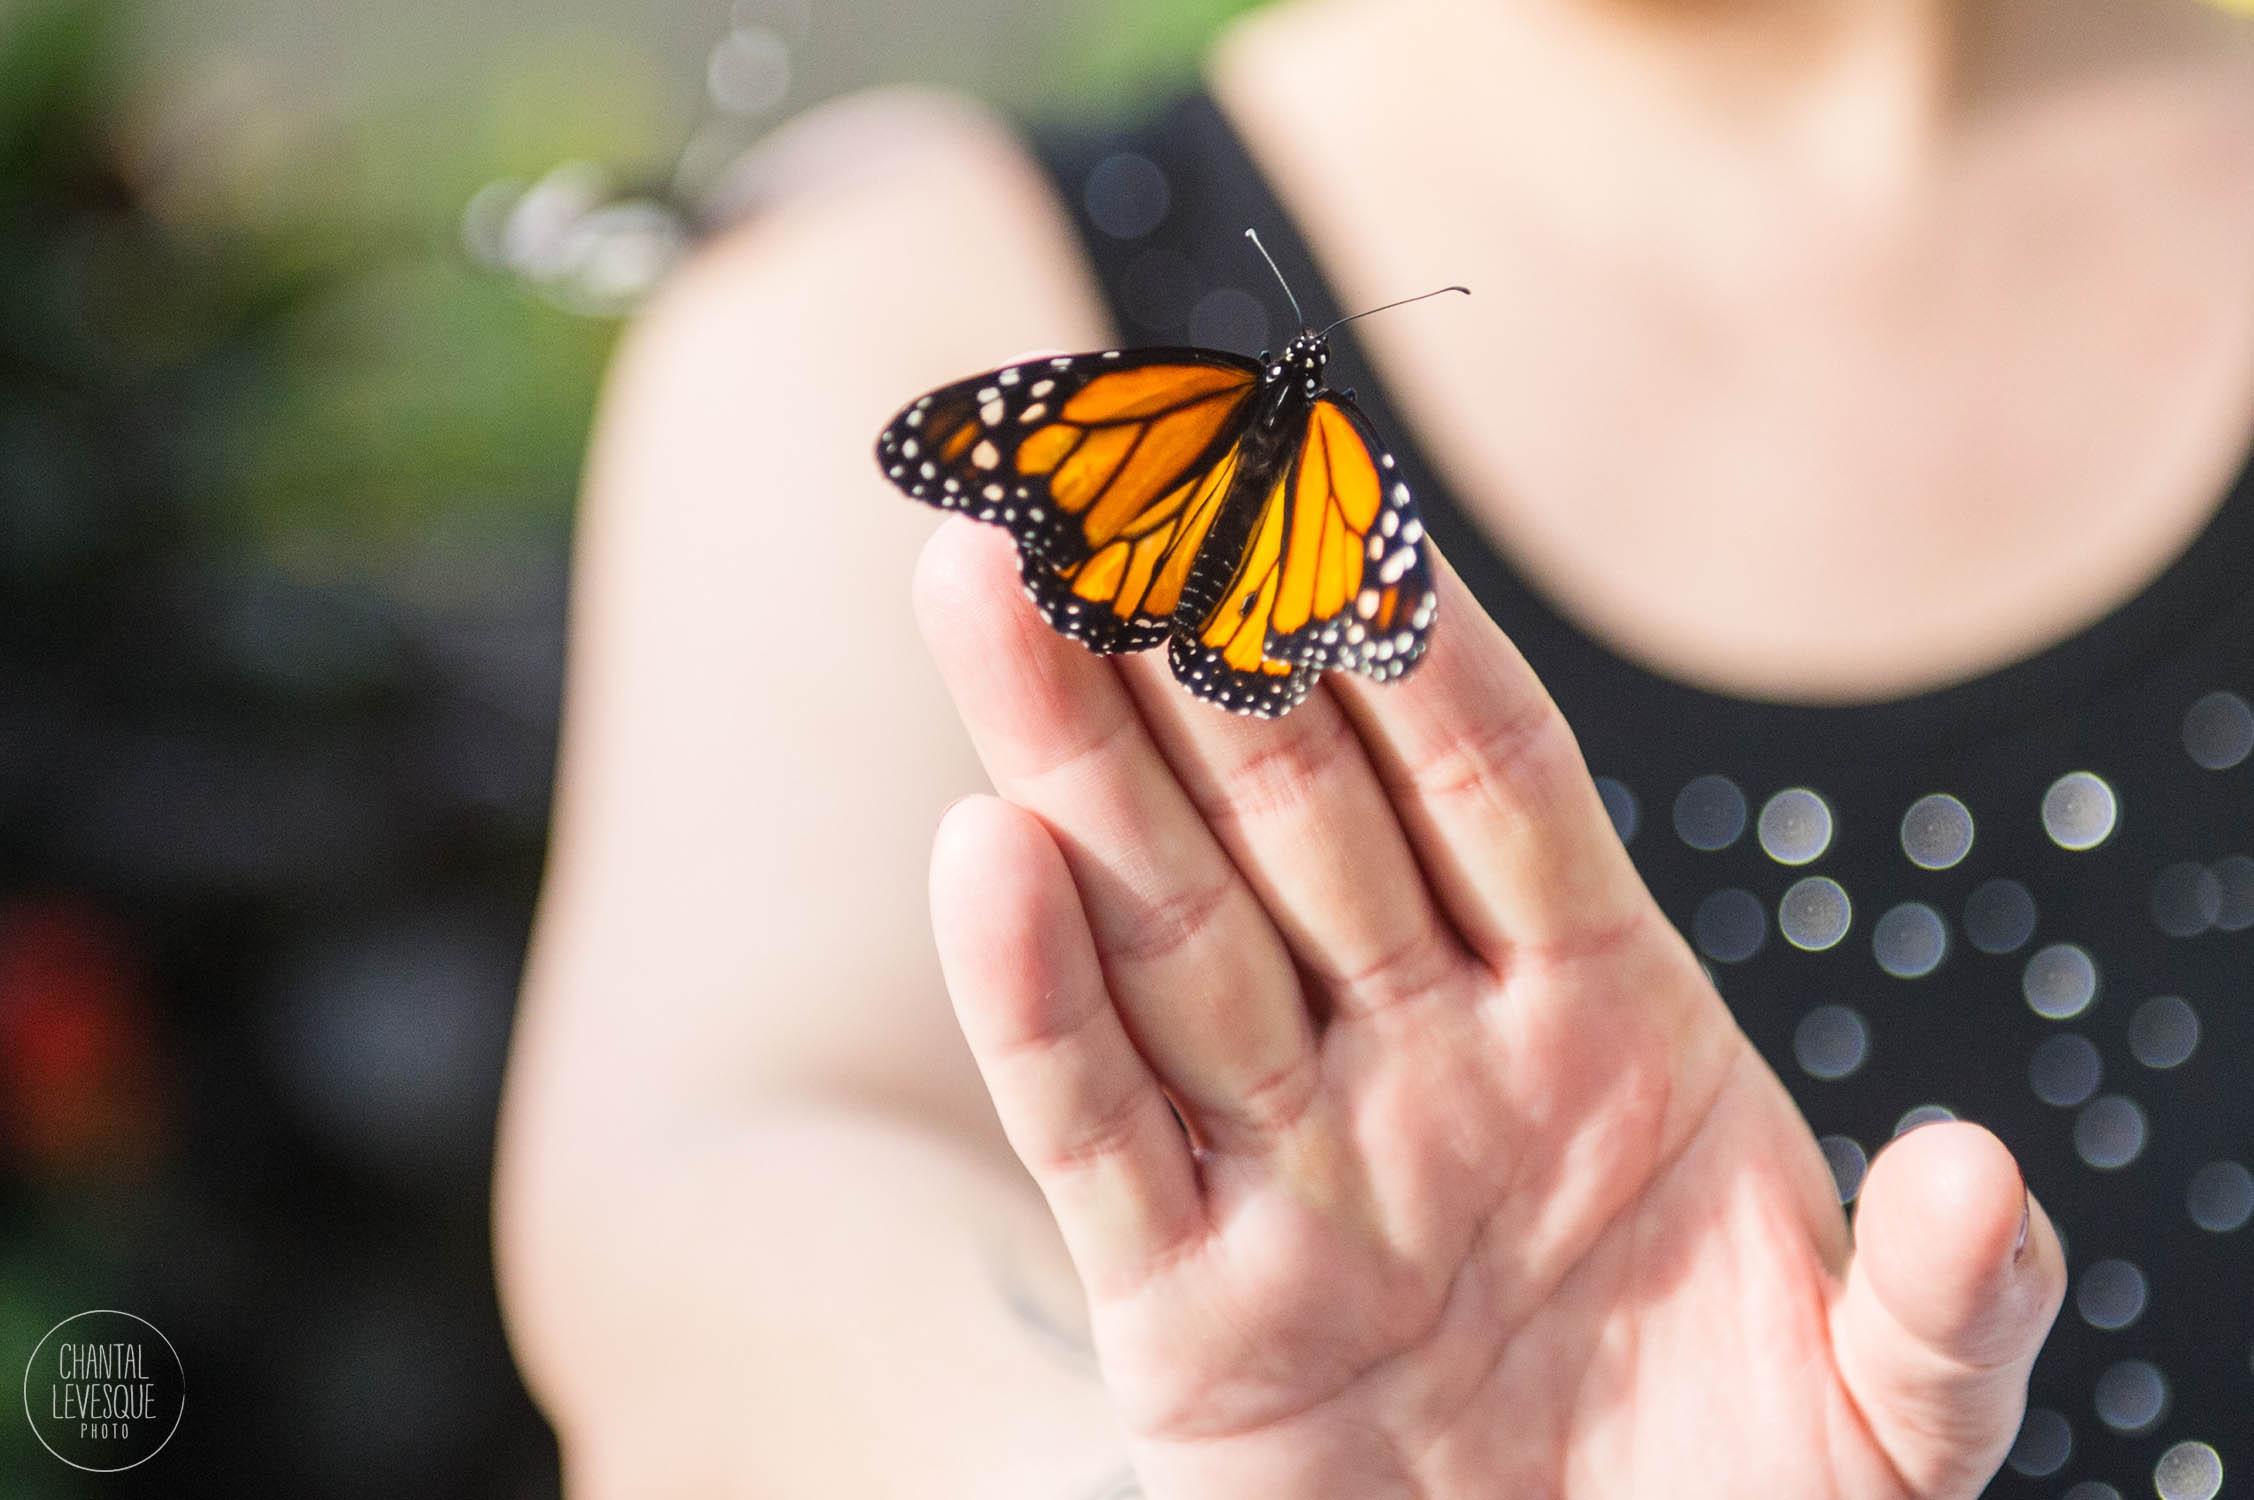 papillons-3604 copy.jpg